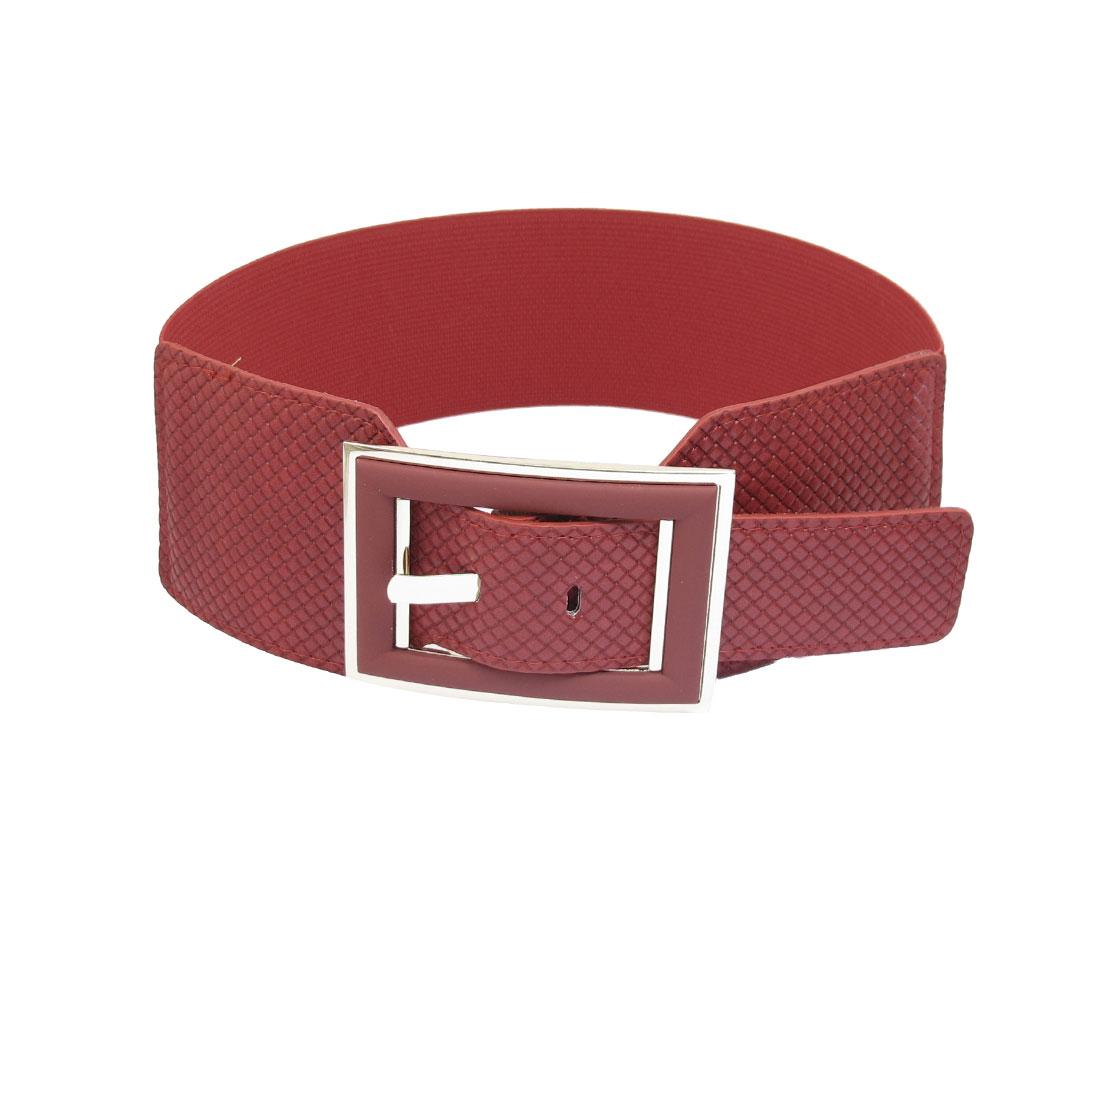 Women Single Prong Buckle Elastic Adjustable Band Waist Belt Red